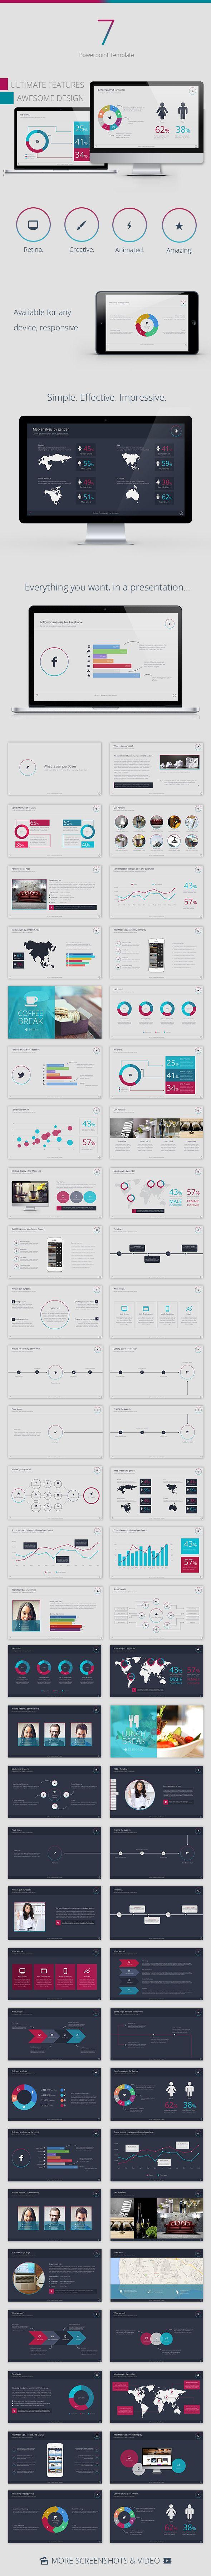 Se7en Powerpoint Template - Creative PowerPoint Templates